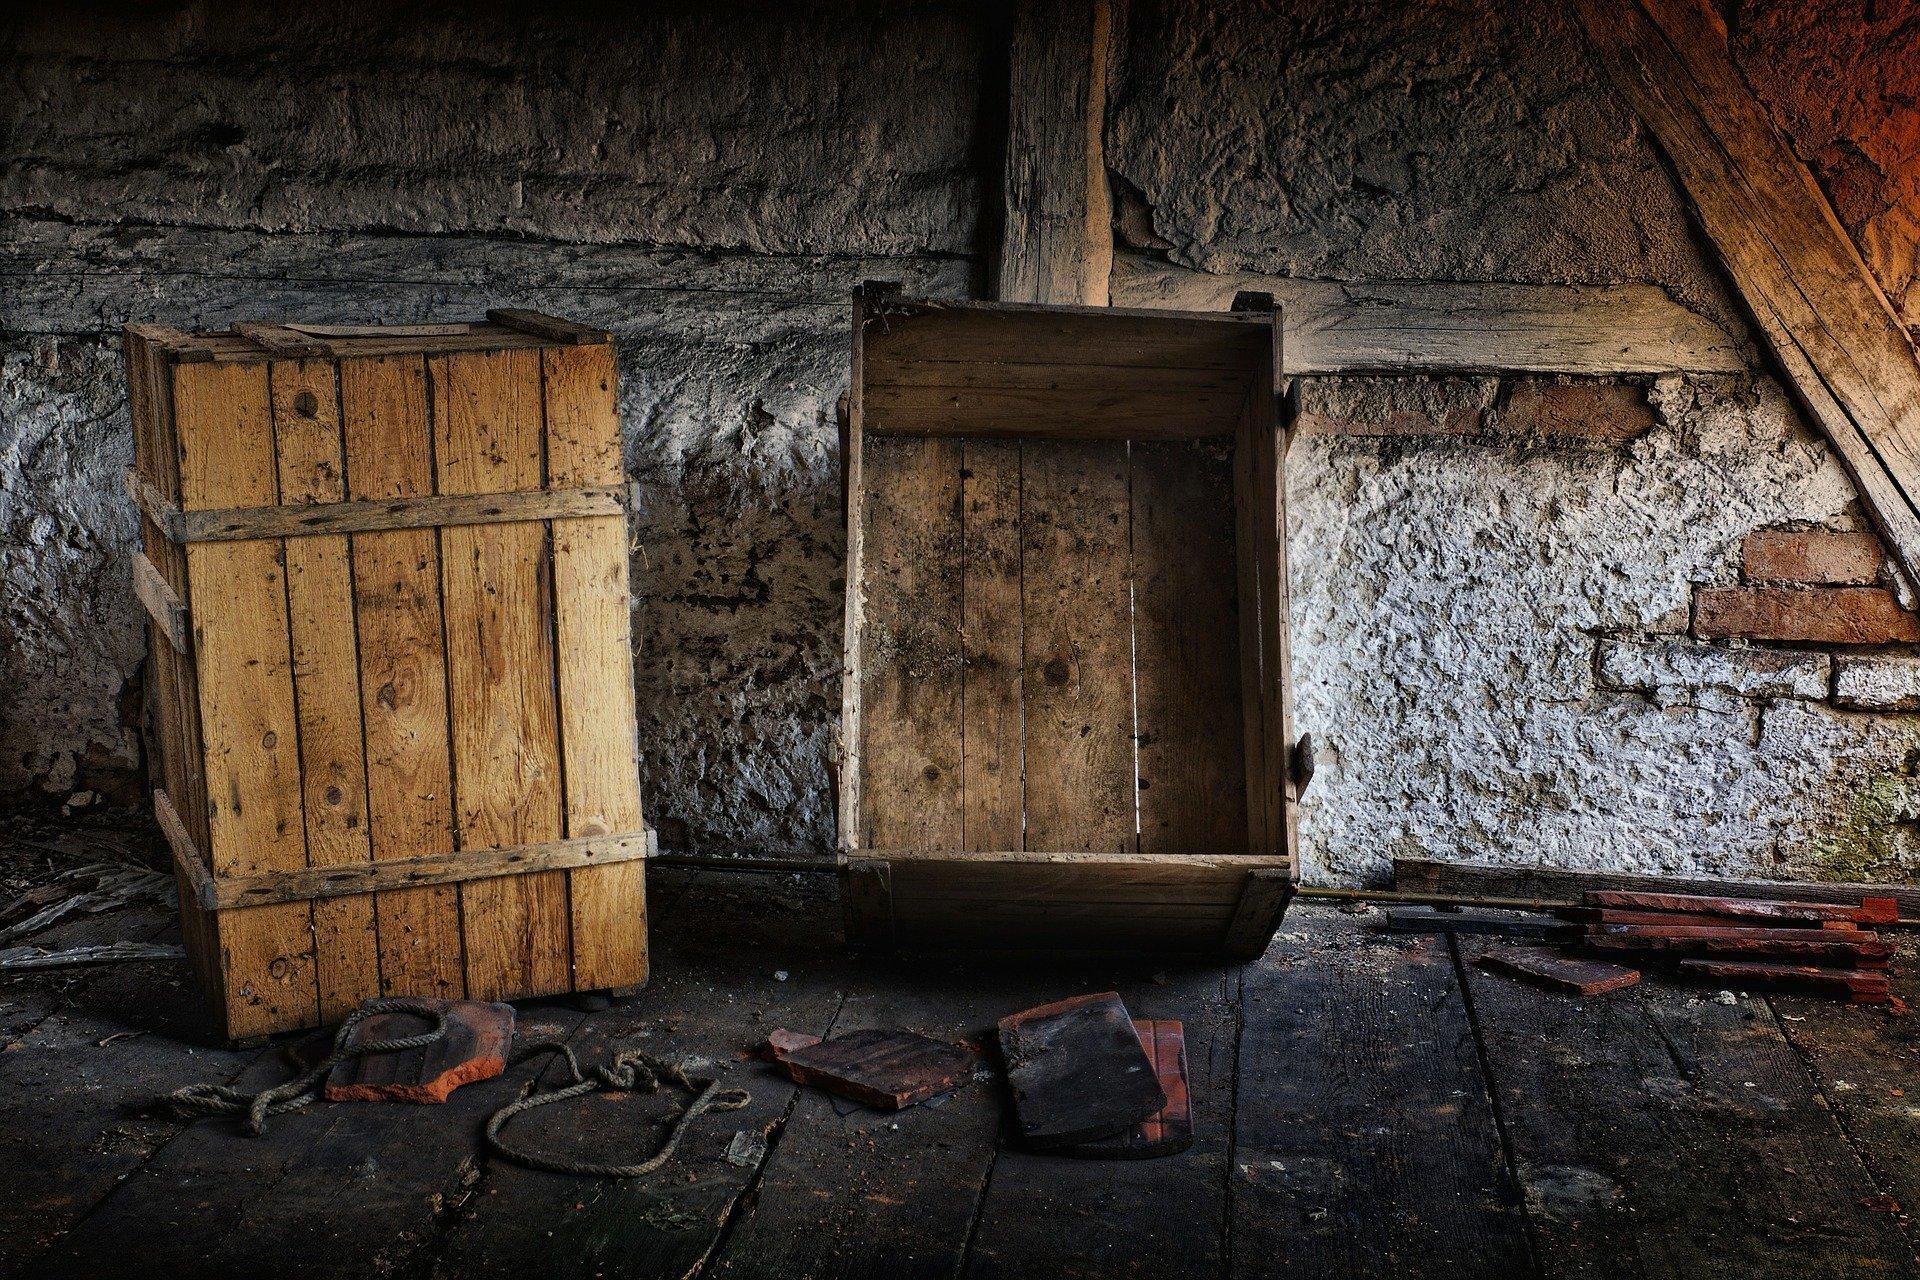 Outside The Box Psychological Flash Fiction By Paul Kindlon